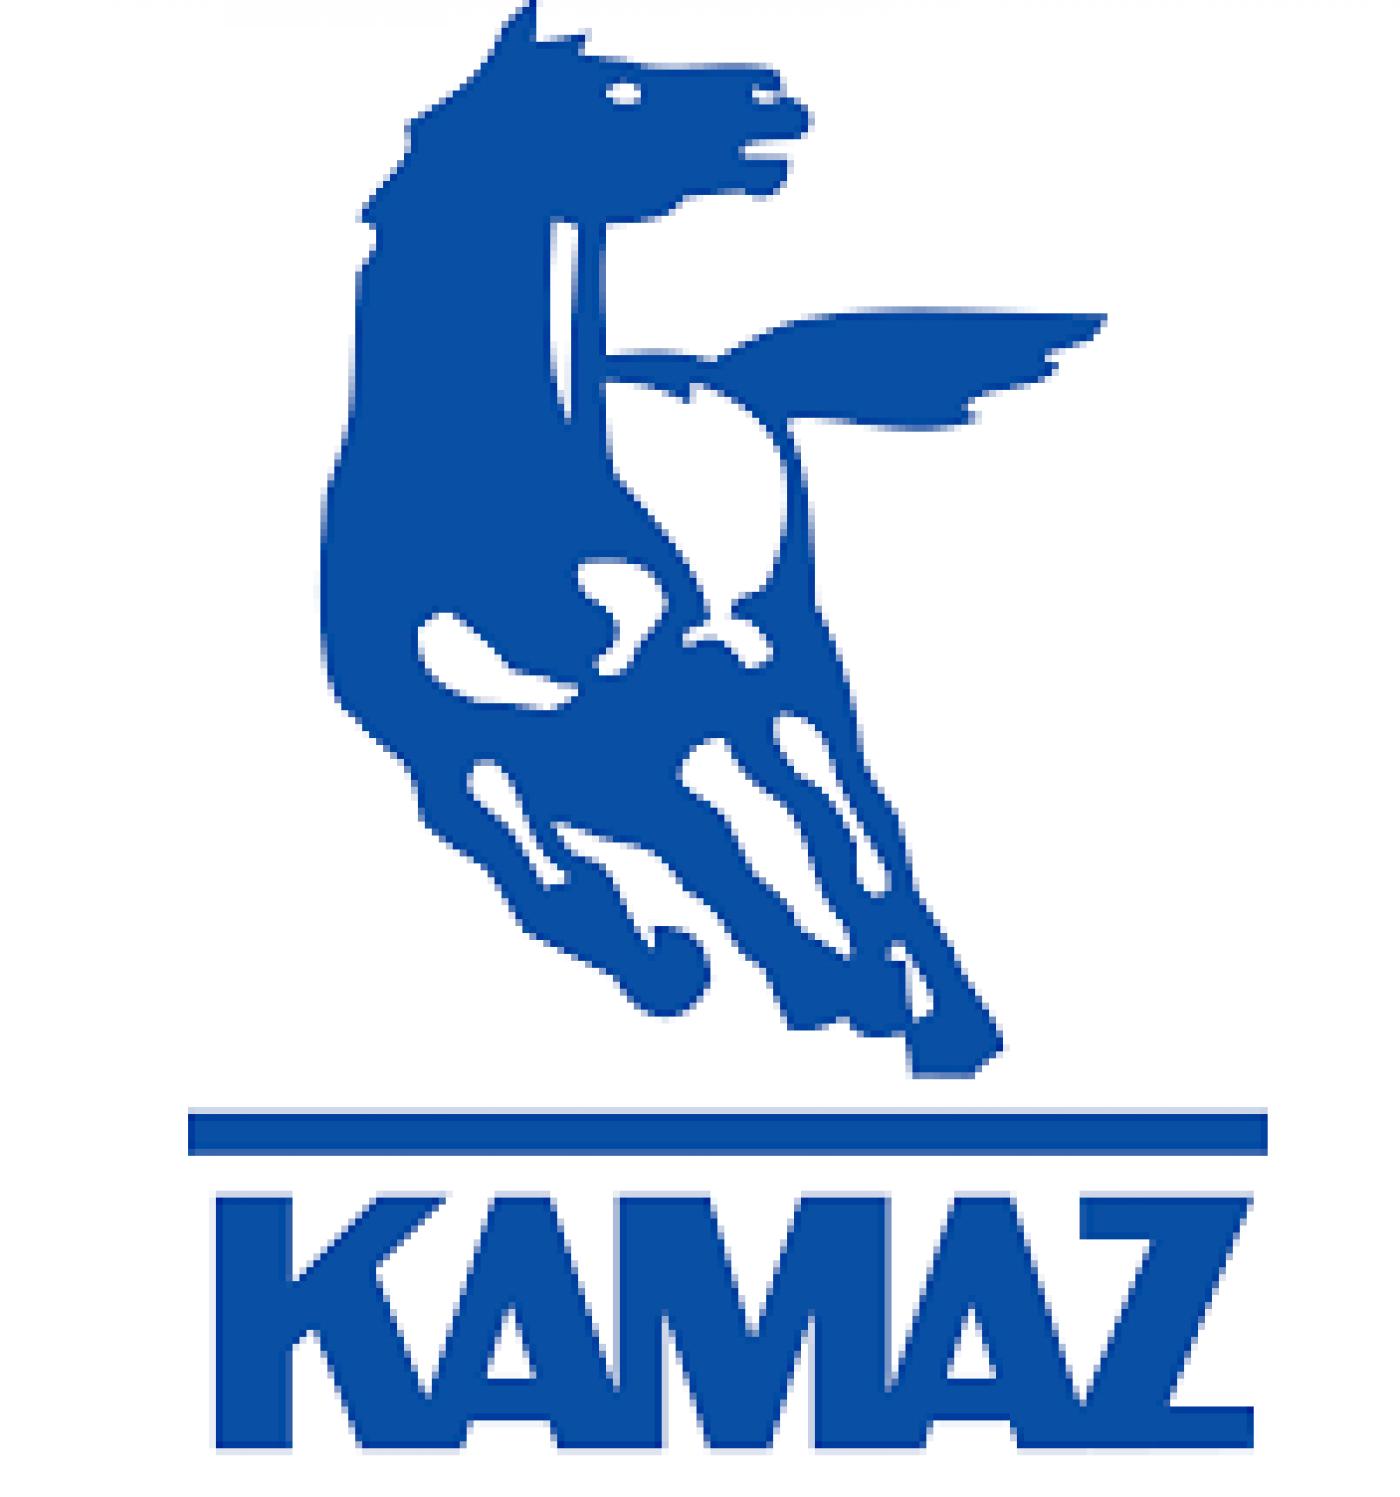 Gía xe tải kamaz  gắn cẩu mới nhất/2021